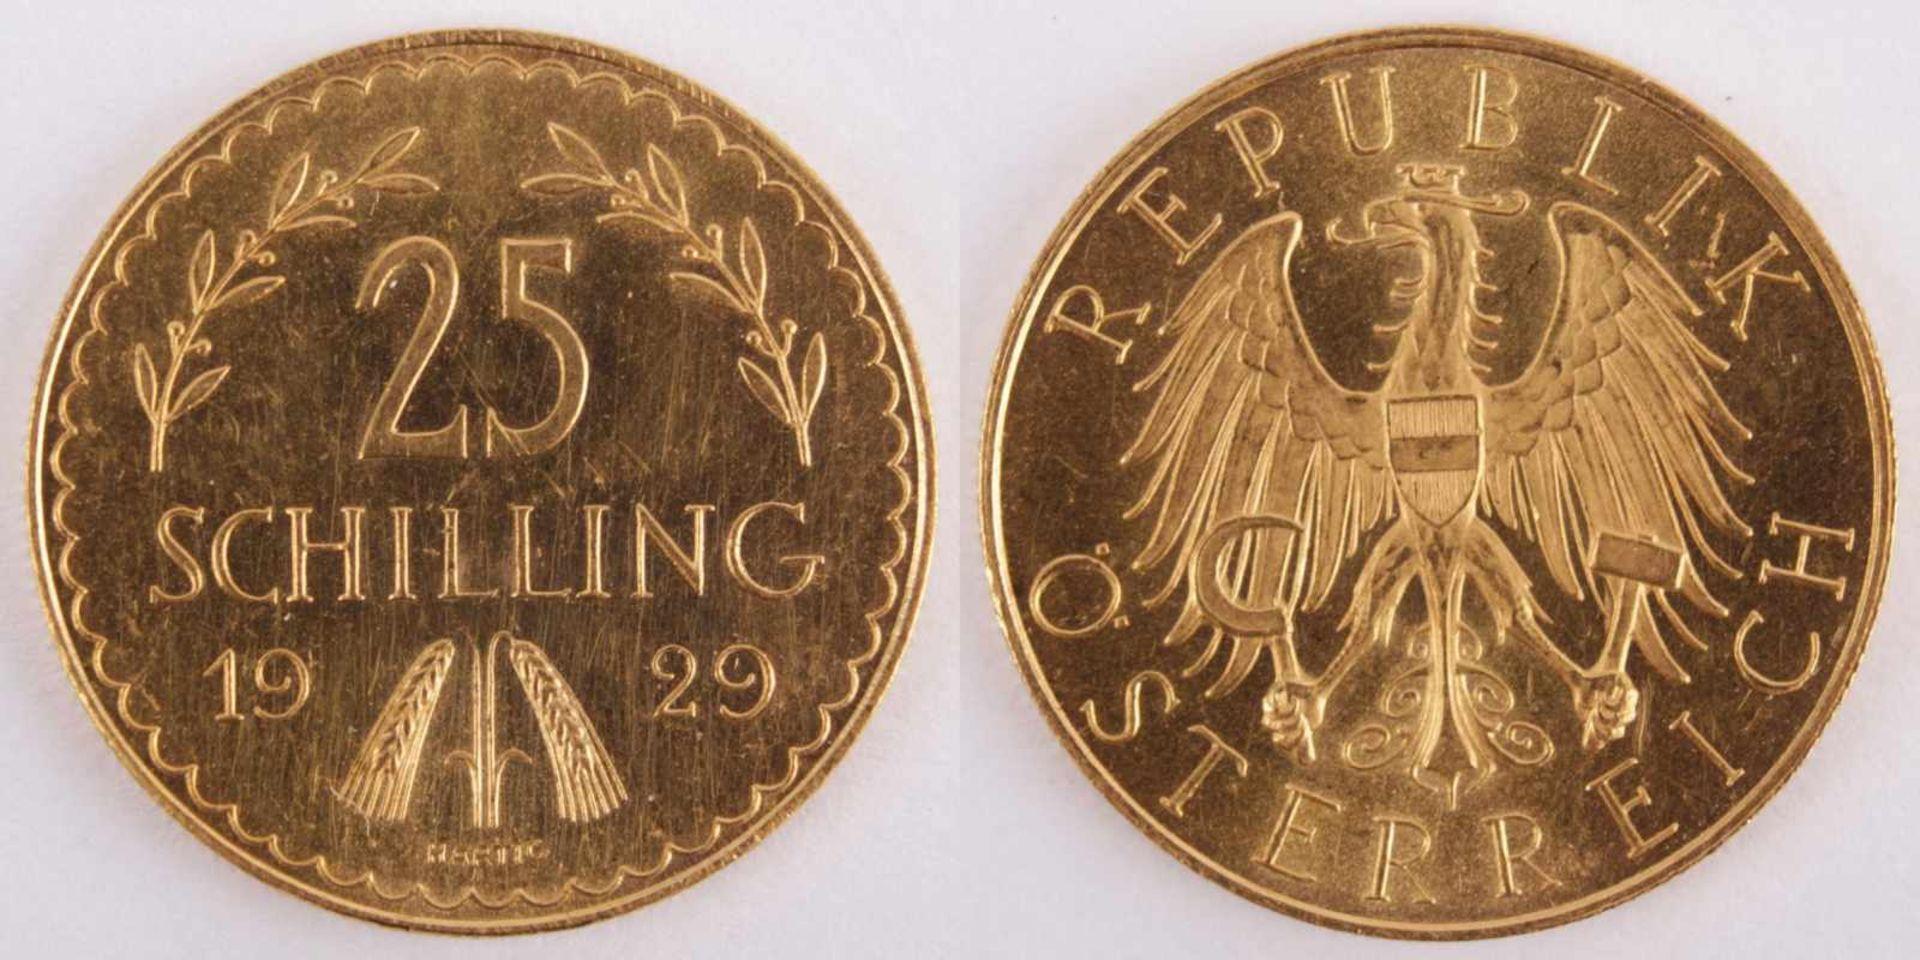 Gold coin: 25 Schilling 1929 Austria, 25 Schilling, year 1929, gold coin, 900/1000 fineness,